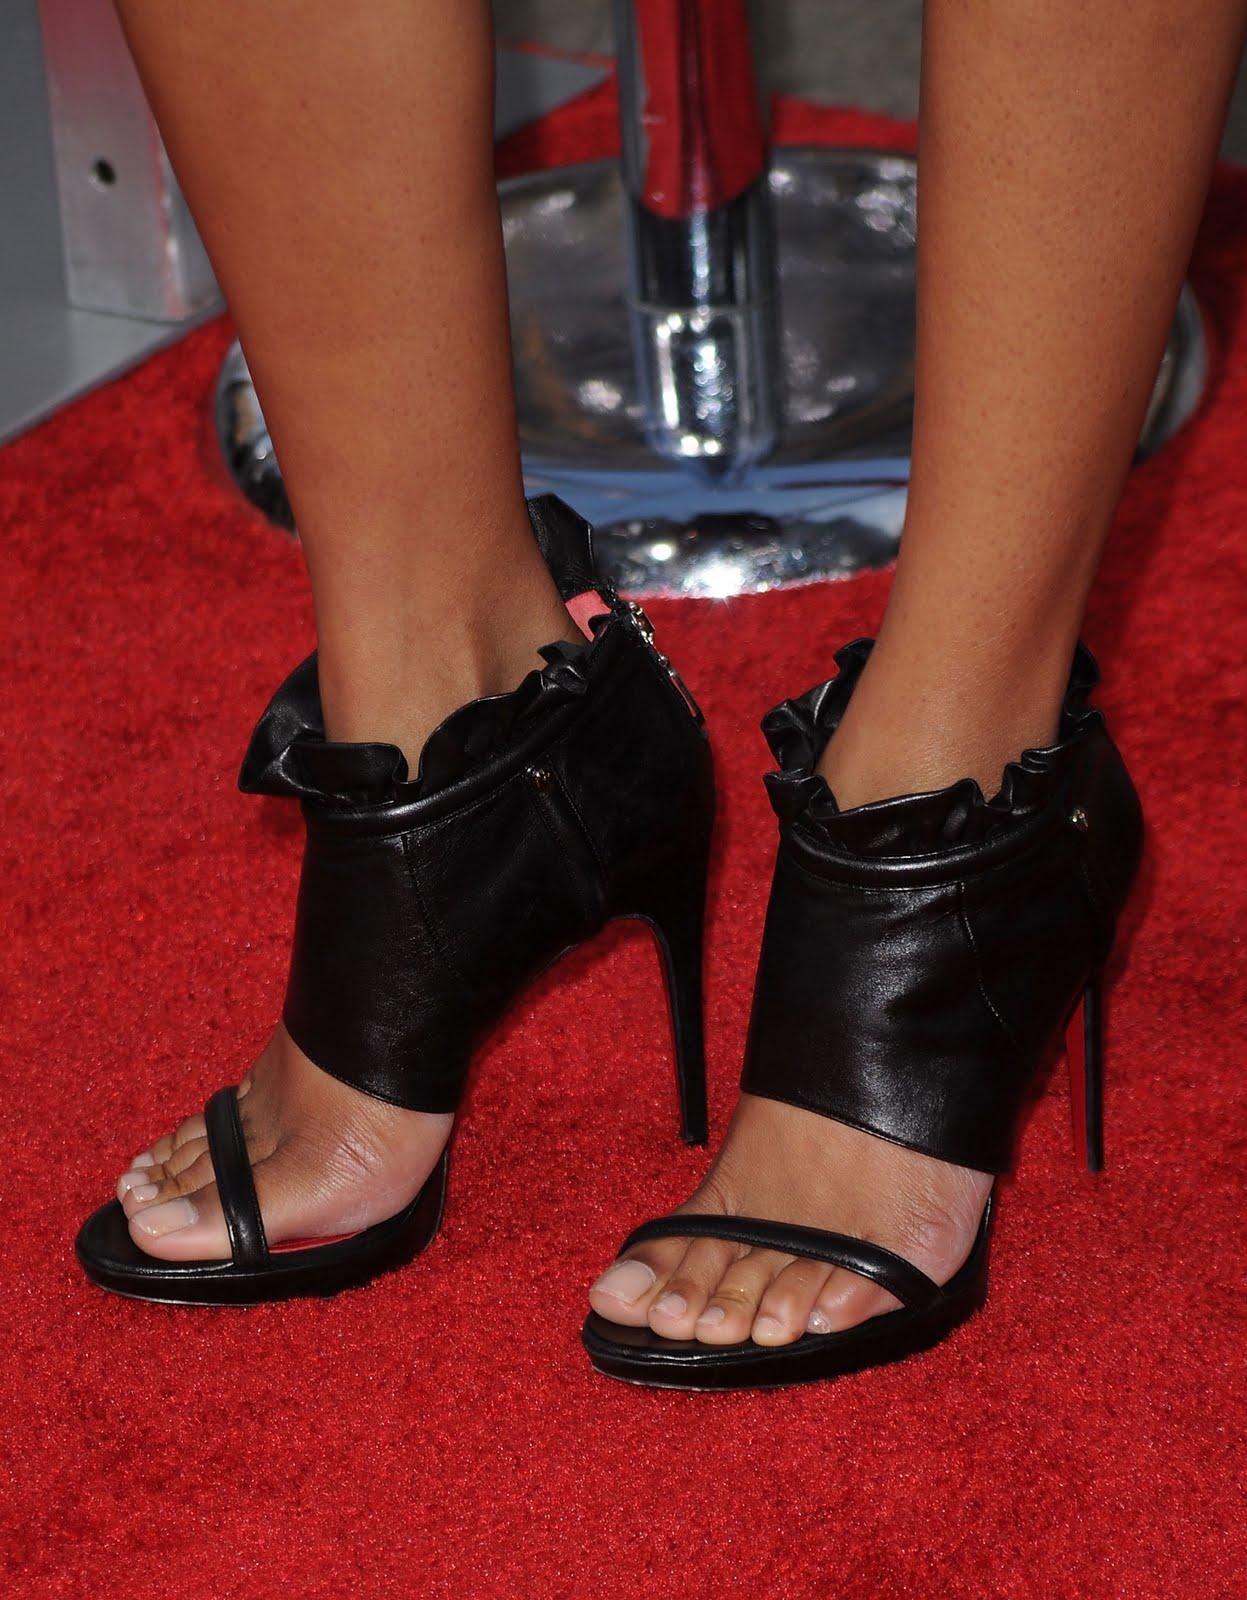 http://2.bp.blogspot.com/_bQ0SqifjNcg/TEaSCc88_0I/AAAAAAAAY3Q/Ns734H9bEx4/s1600/zoe-saldana-feet-4.jpg